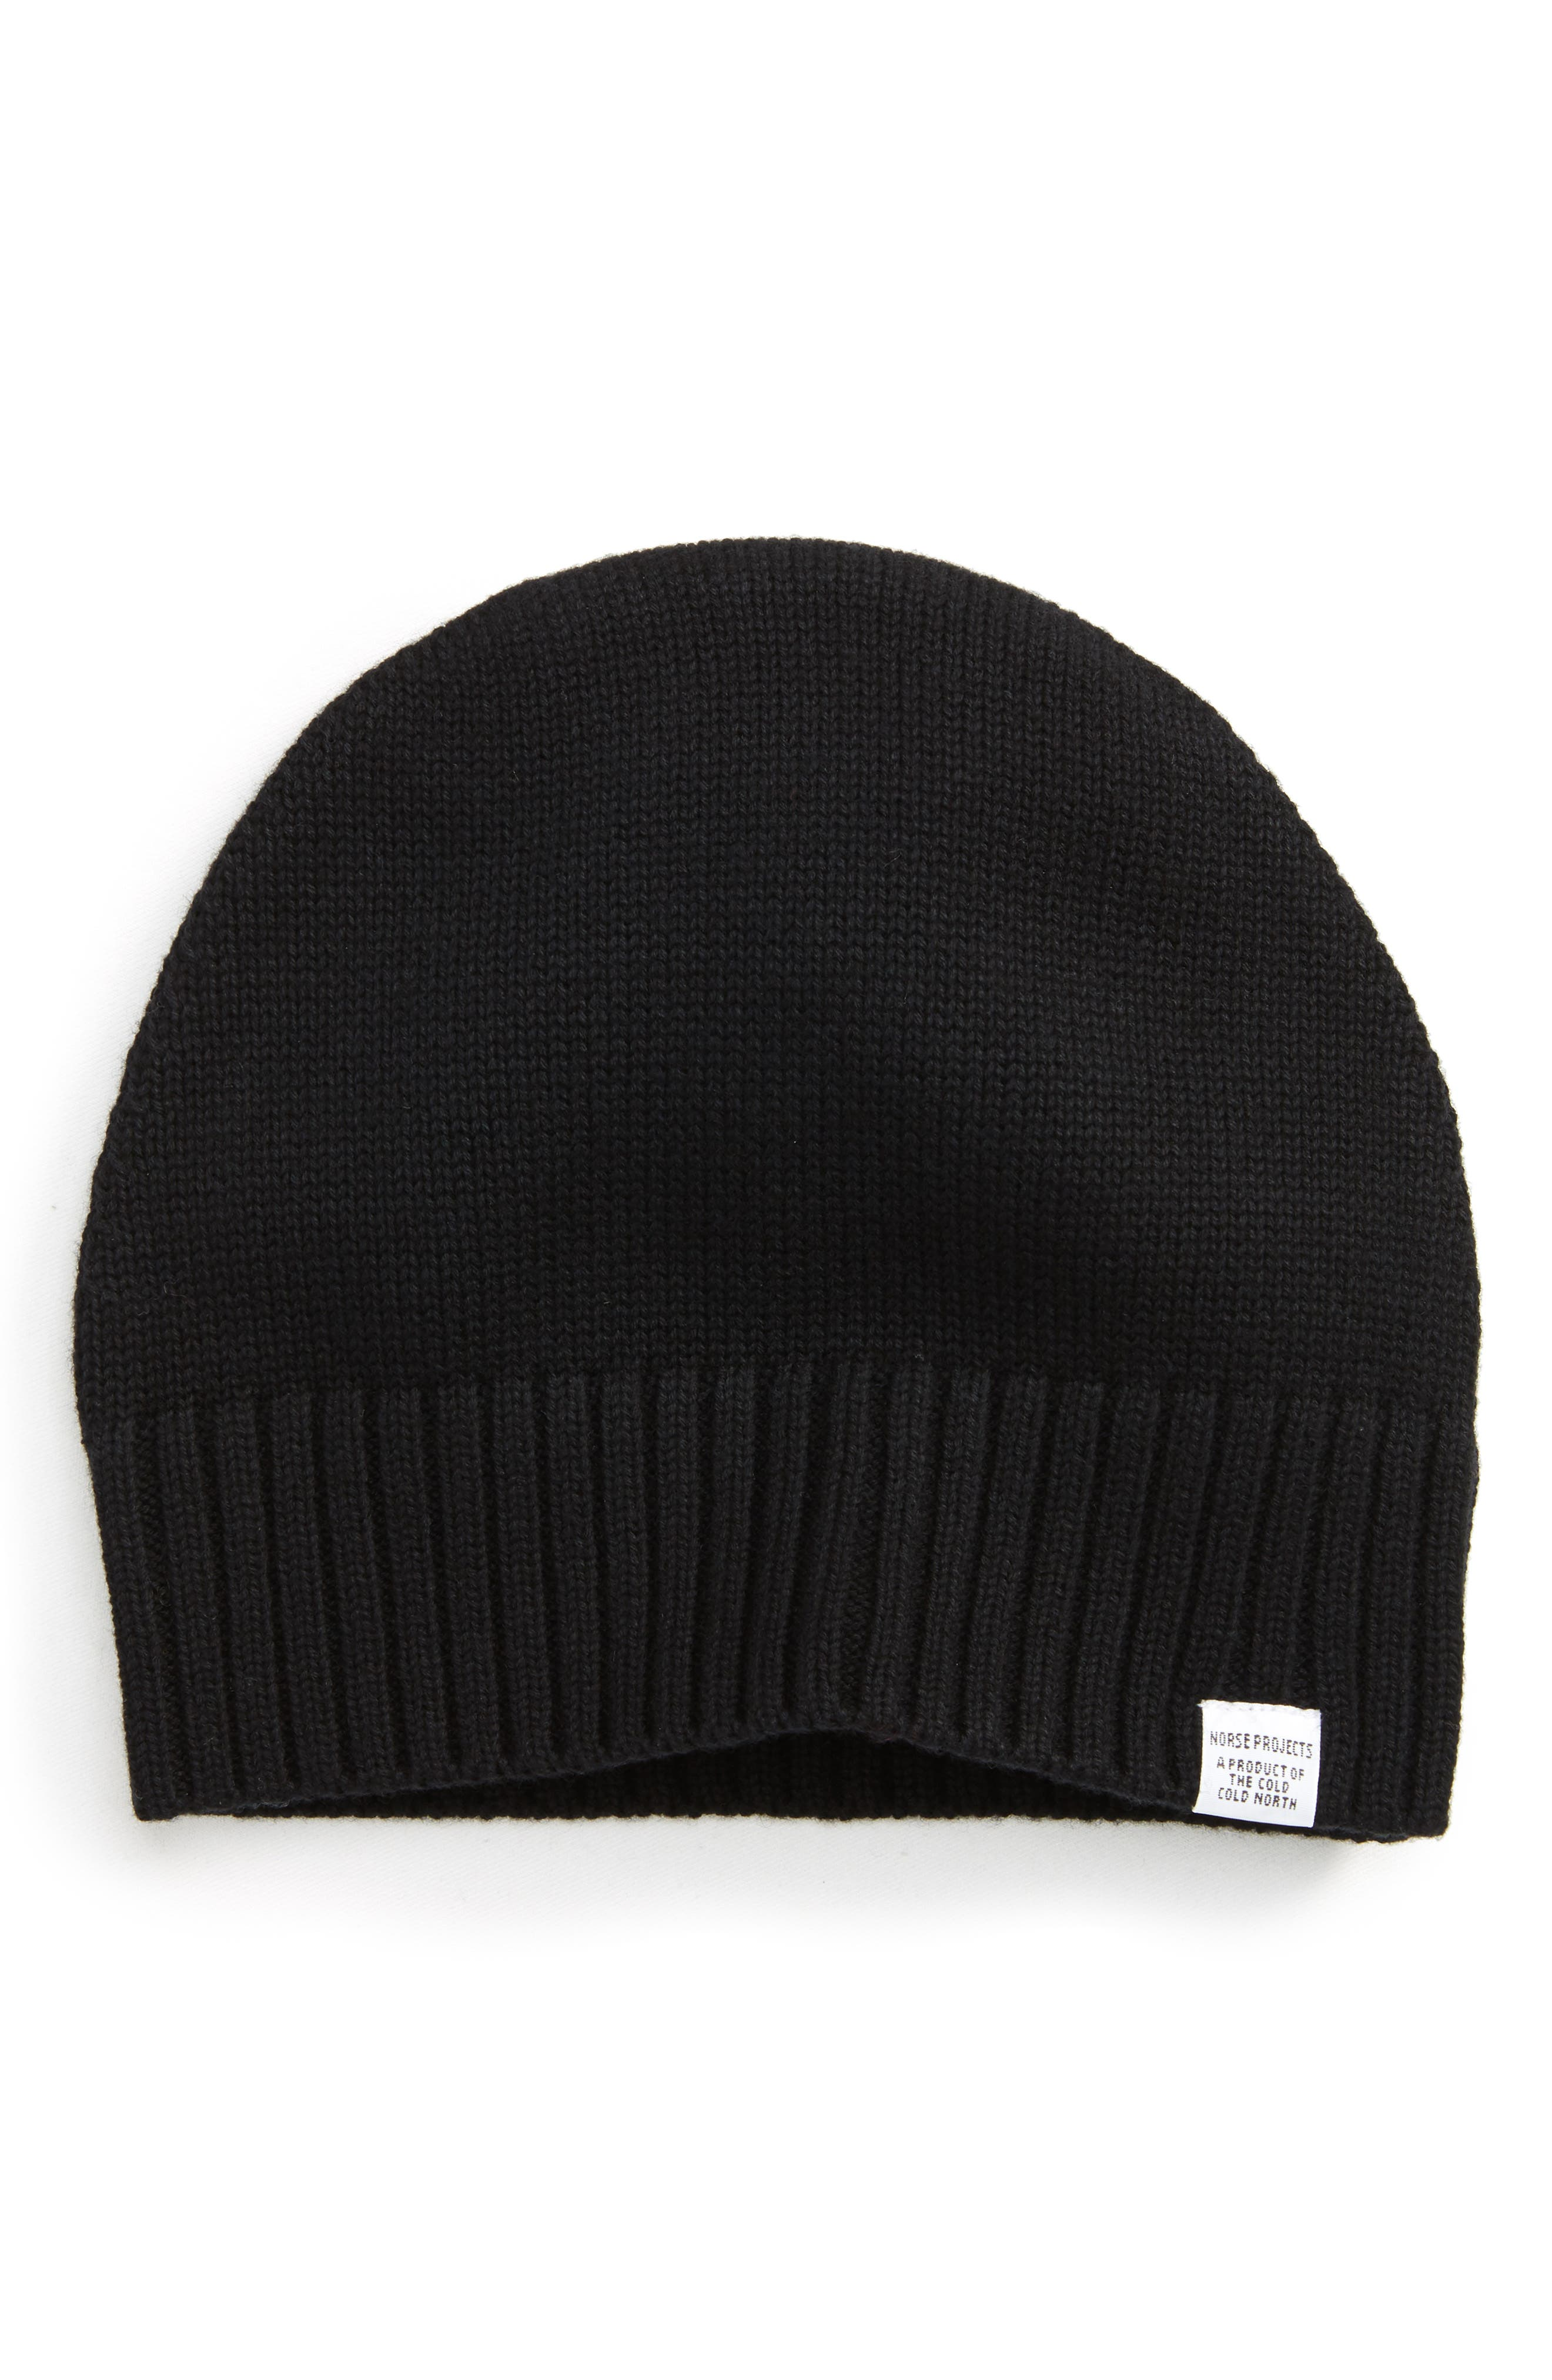 Norse Project Knit Cap,                         Main,                         color, Black